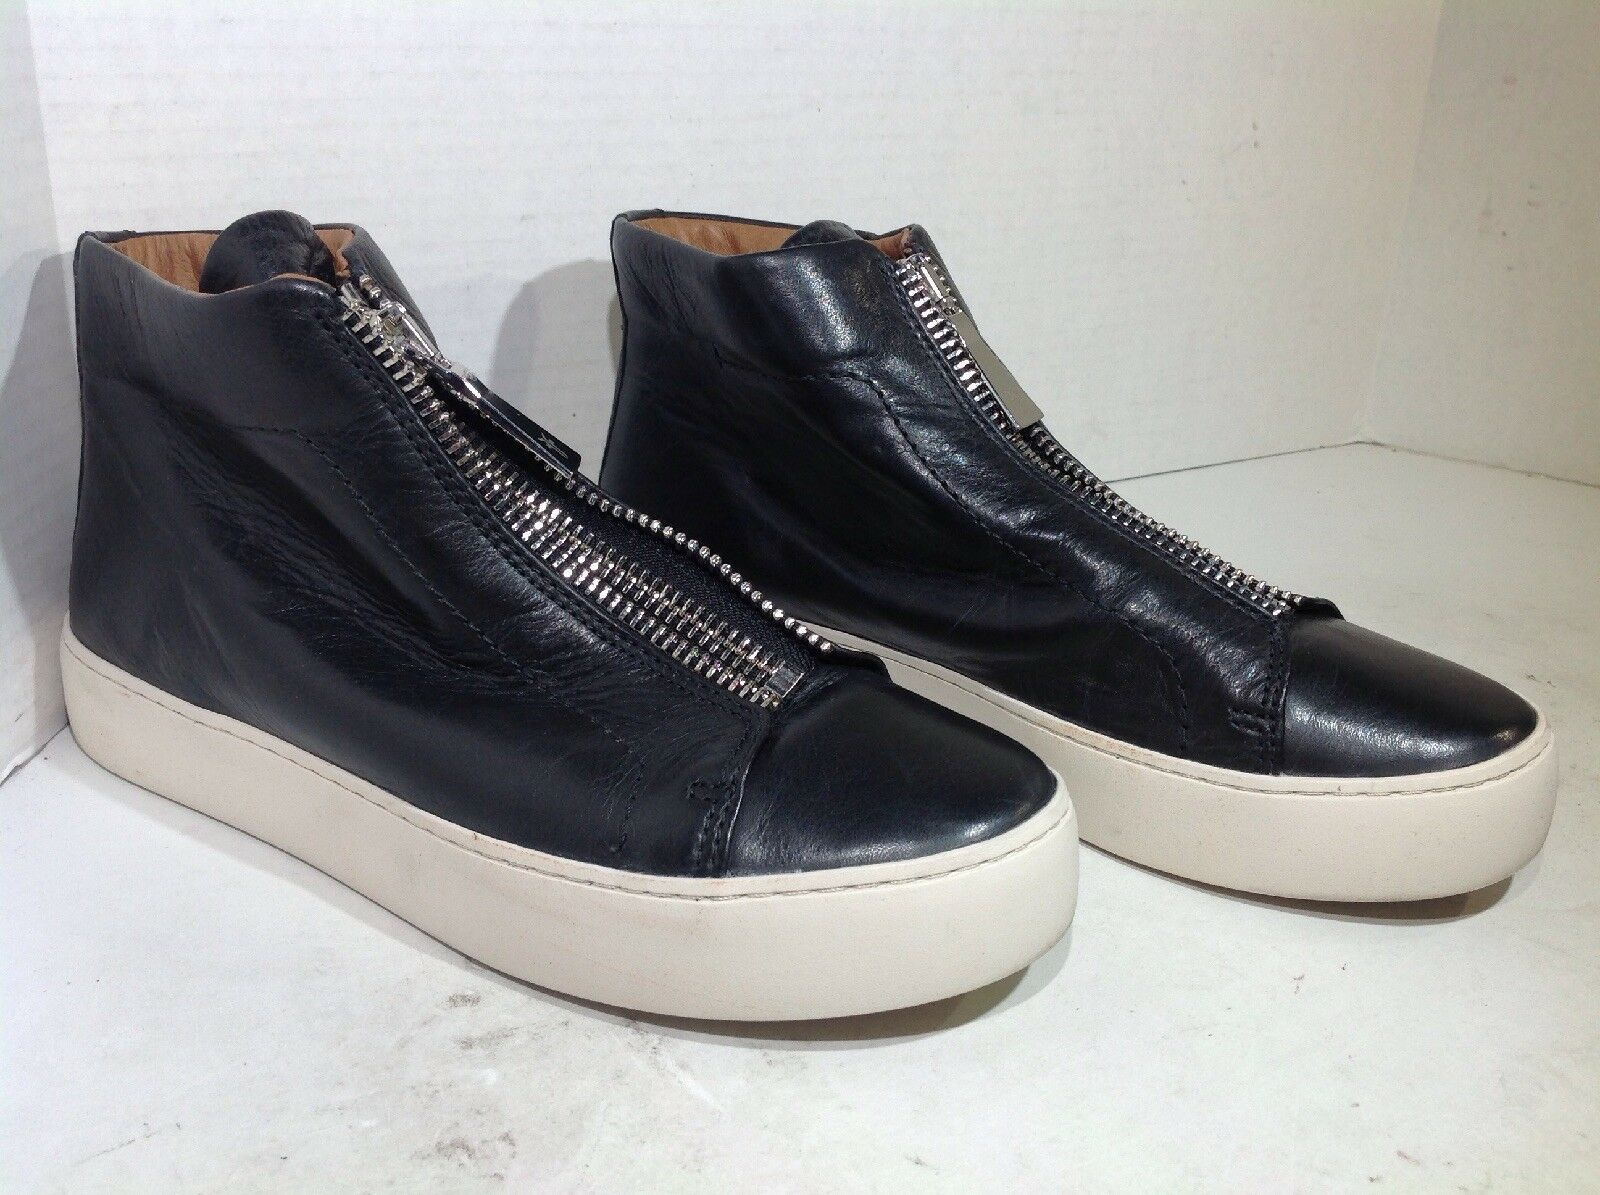 Frye Lena Women's Size 7.5 Black Leather Hi-top Fashion Sneakers shoes FB2-10